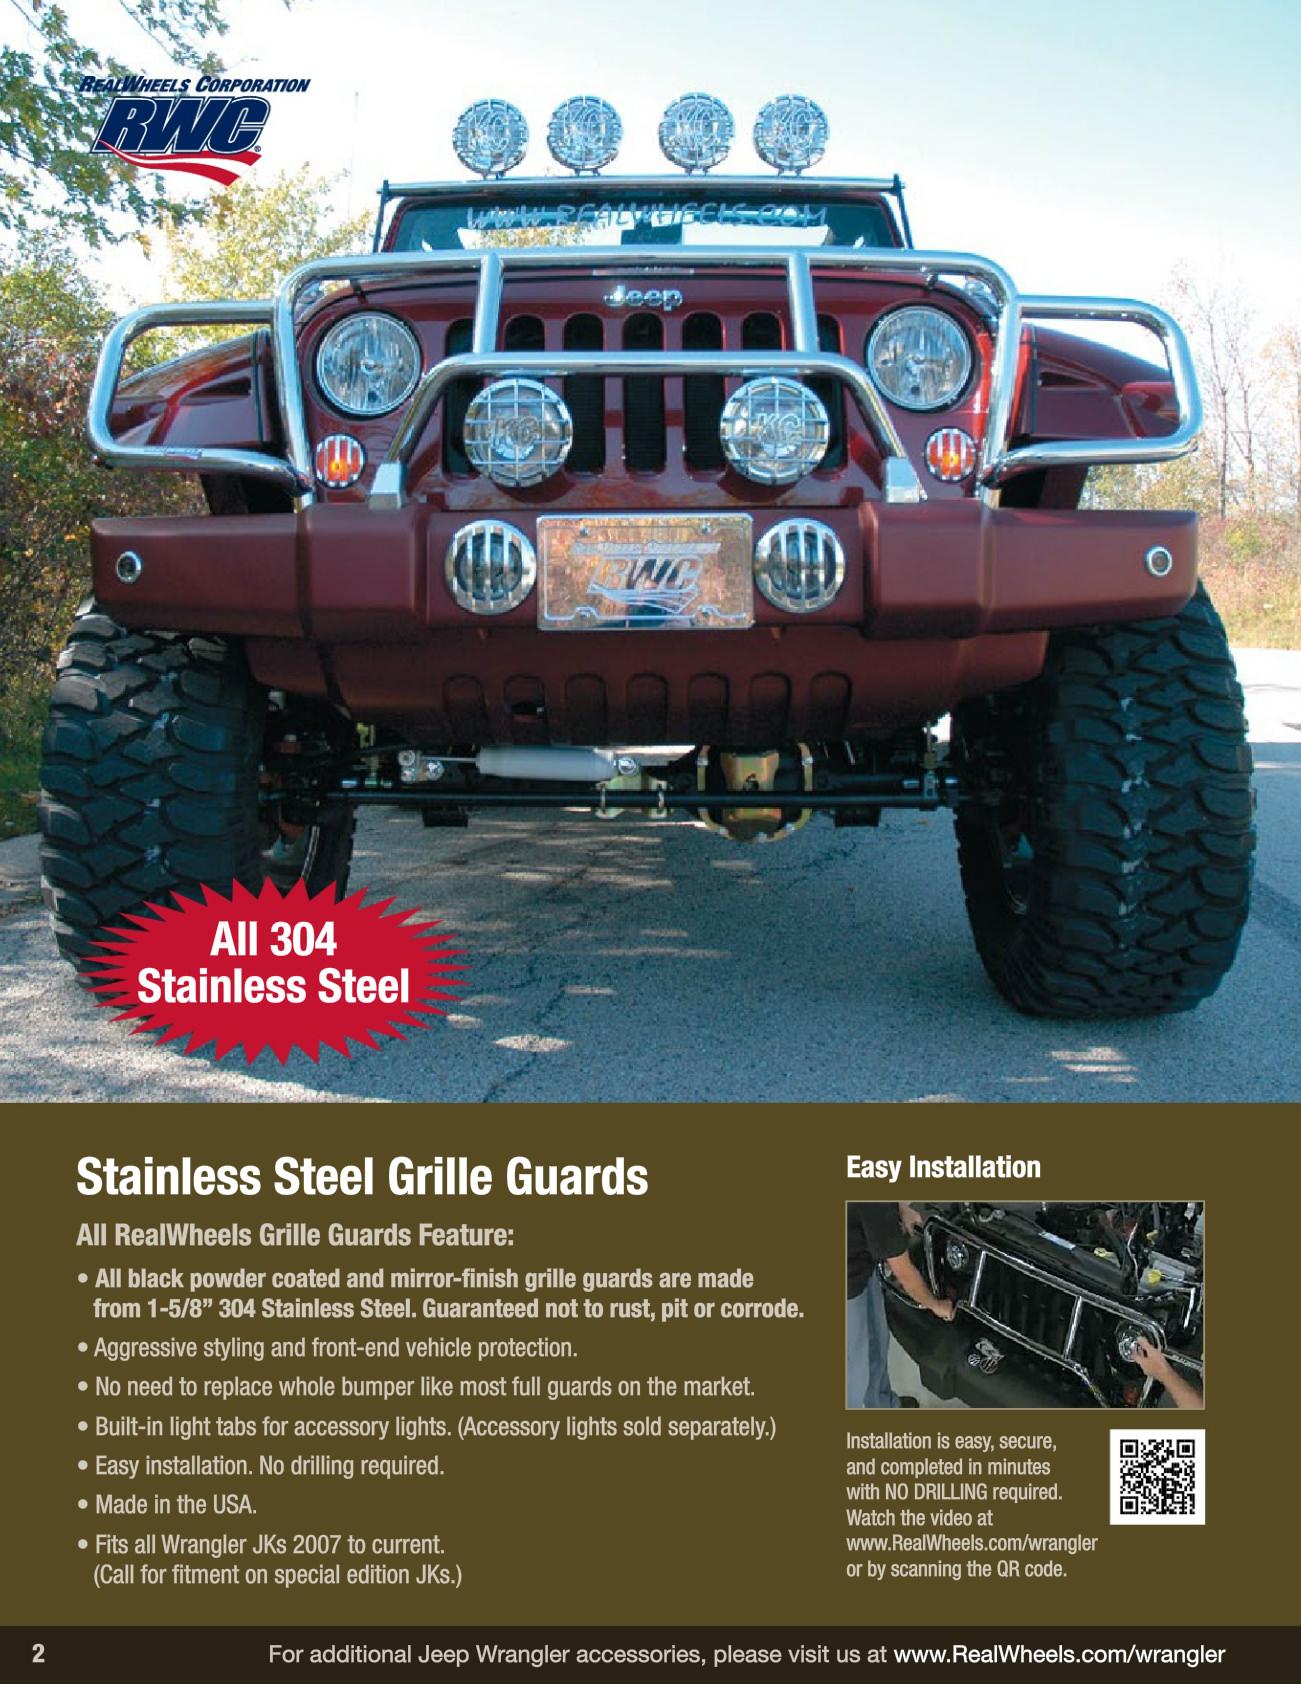 RealWheels RW221-2BP-J Billet Black Powder Coated Large Adjustable Seat Handle for Jeep Wrangler